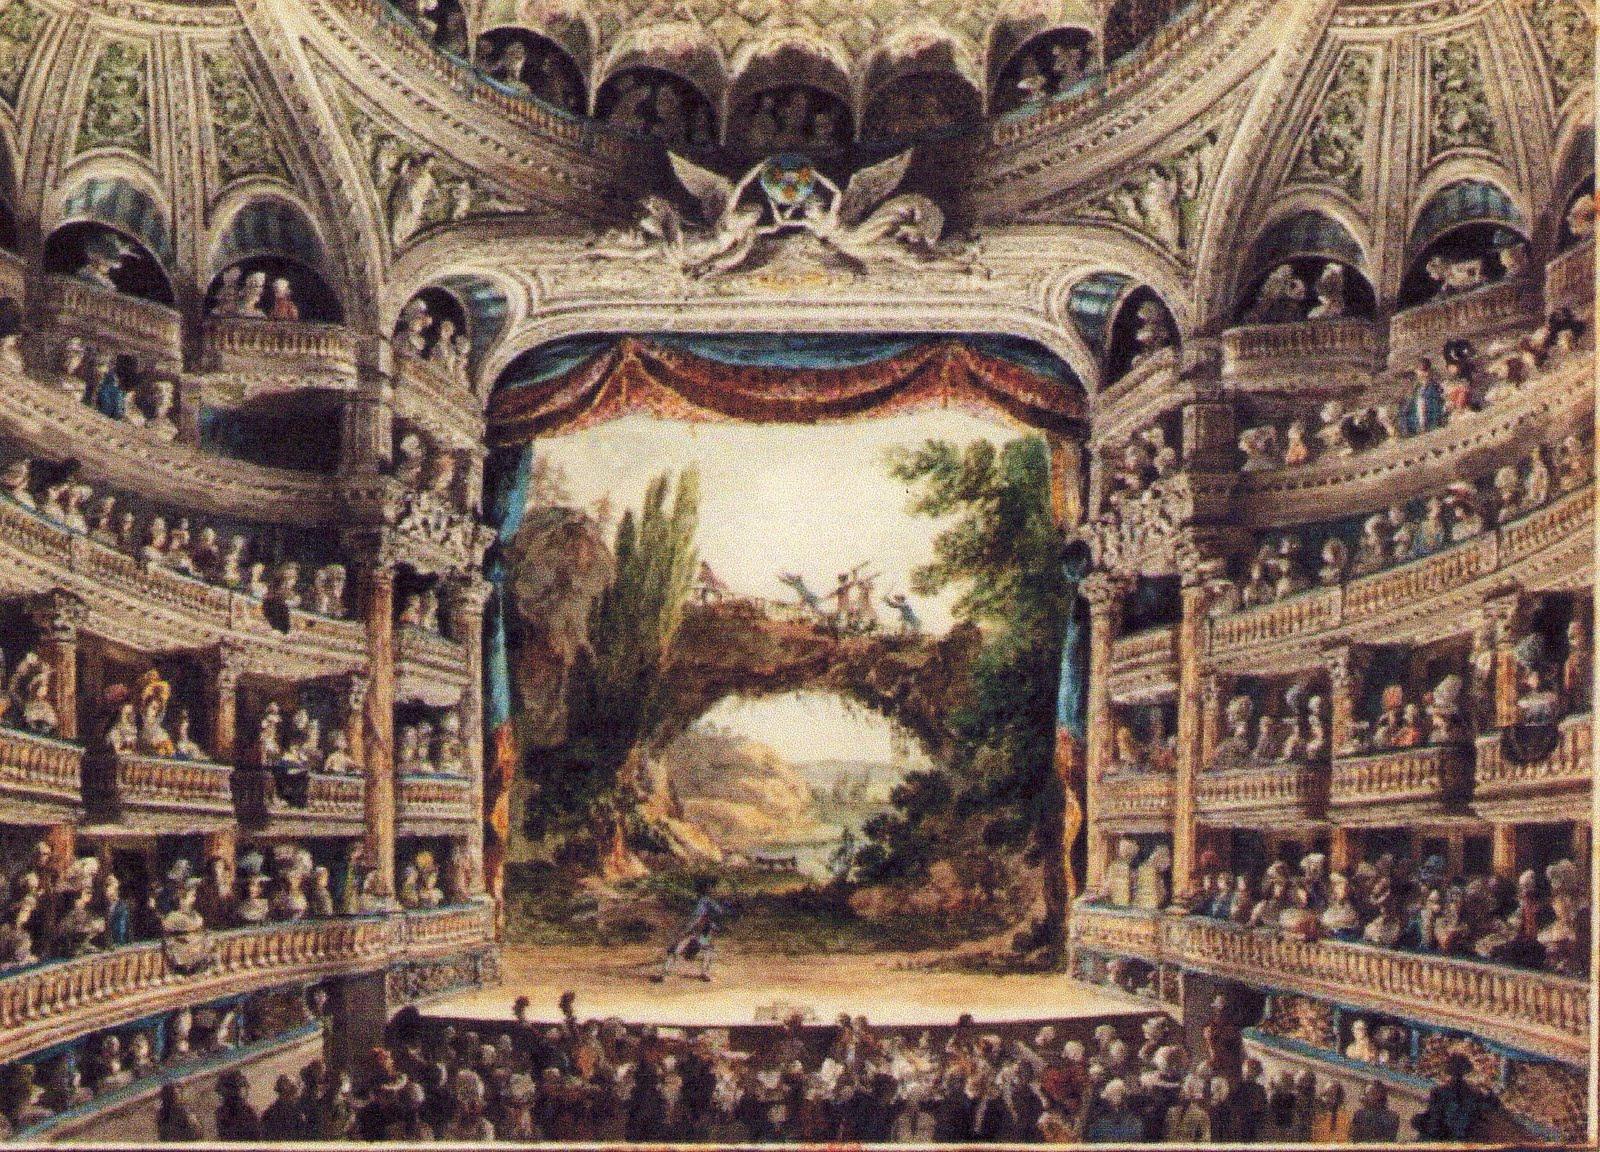 The globe theatre in the medieval period english literature essay